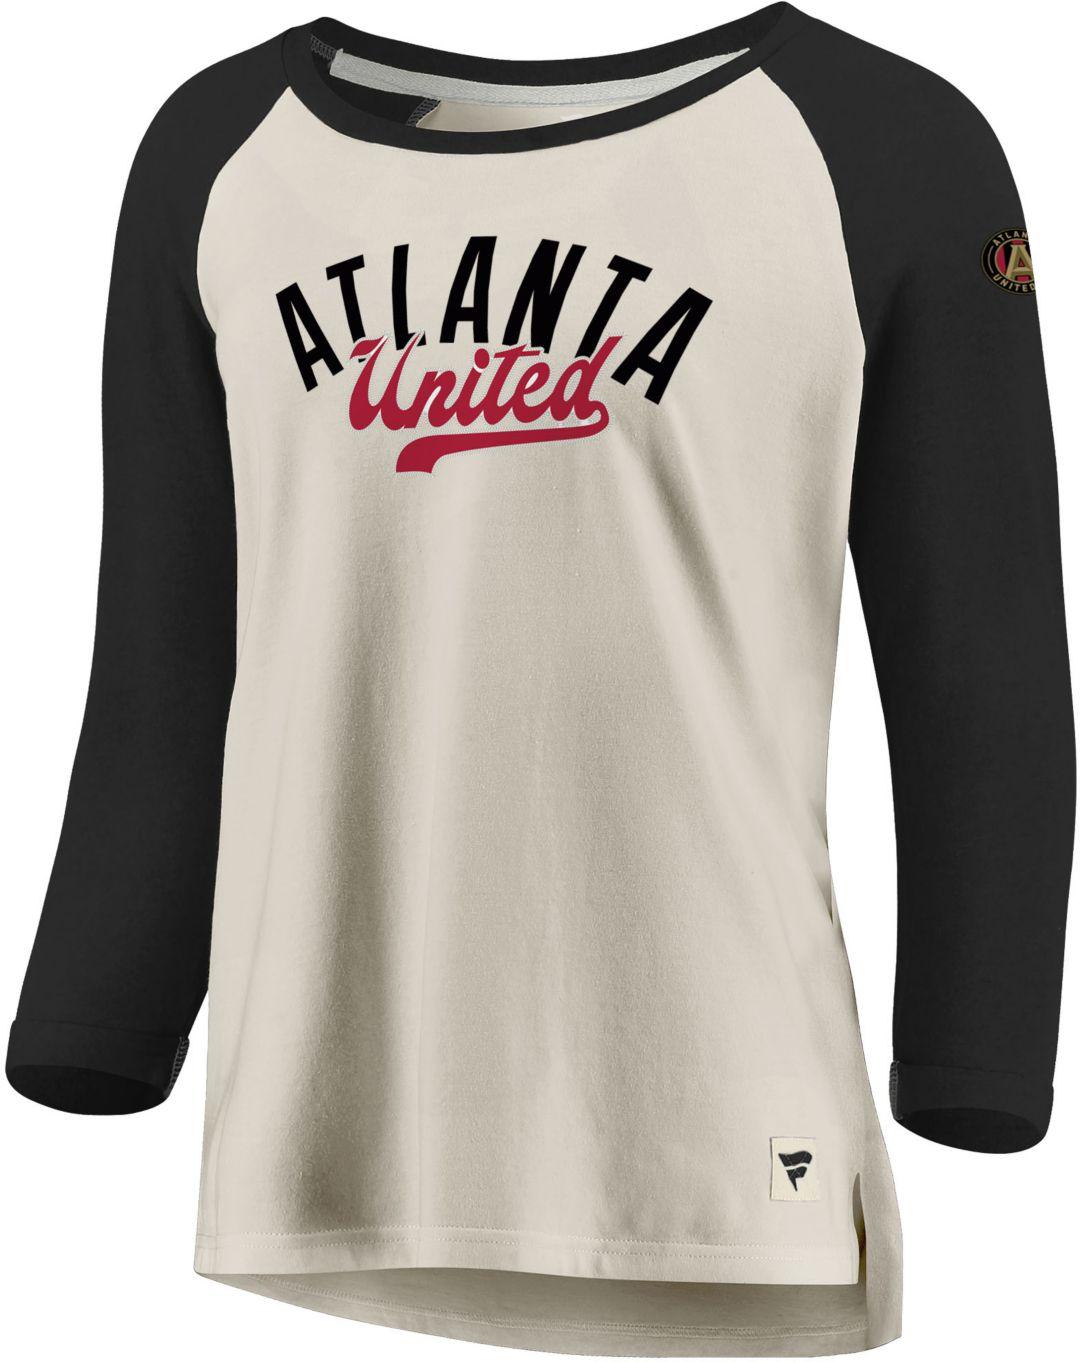 promo code 03587 daa17 MLS Women's Atlanta United Rolled White Three-Quarter Shirt